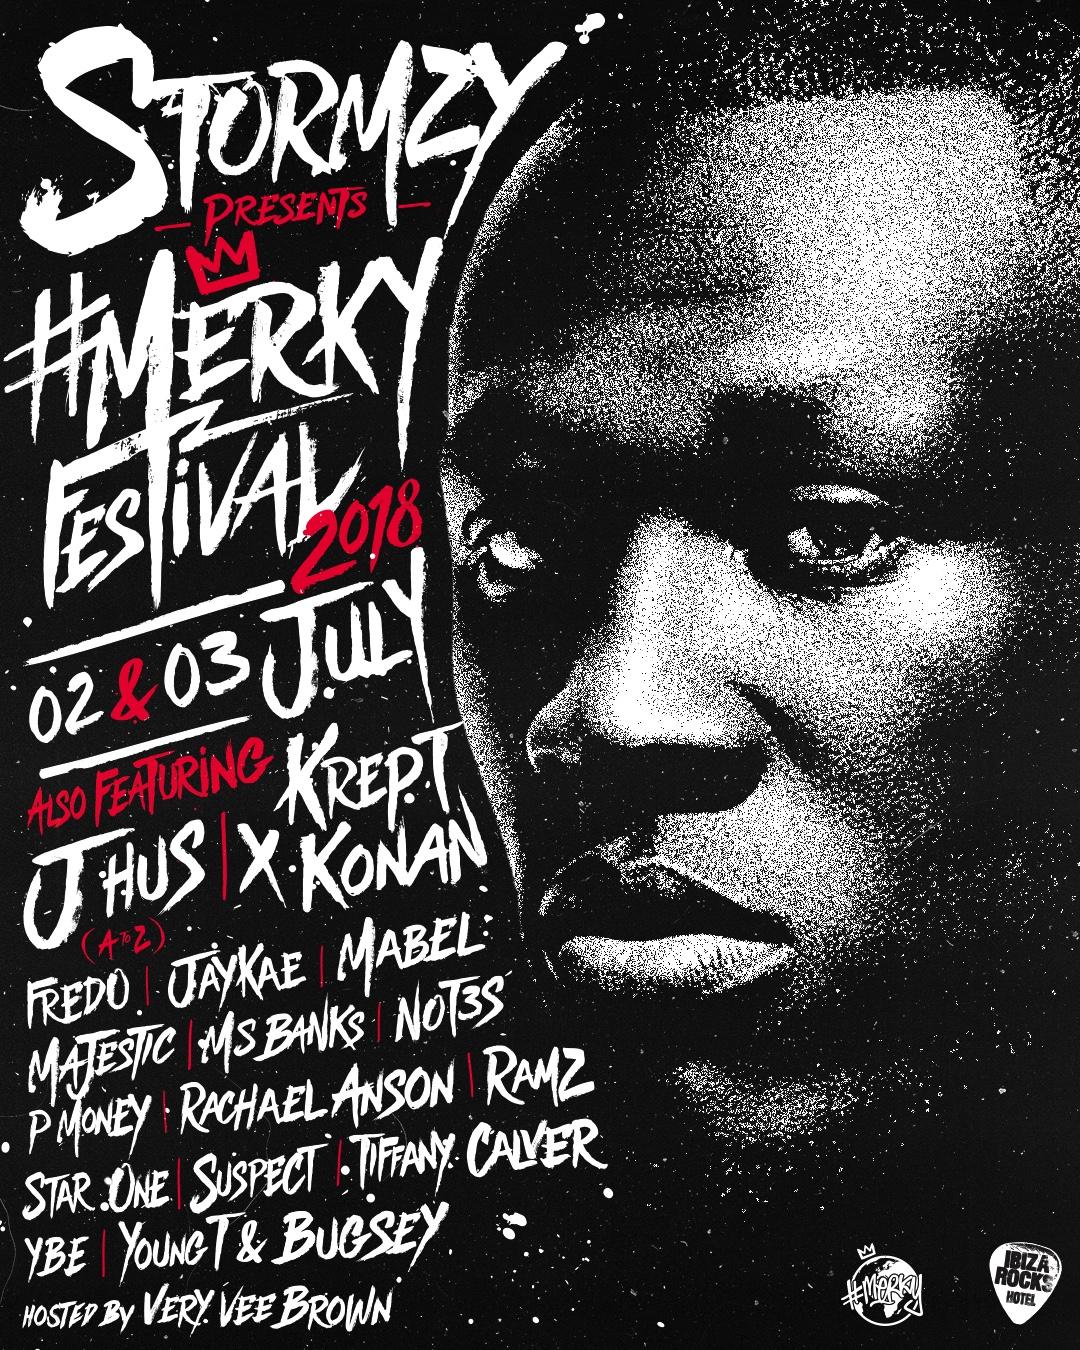 Stormzy #Merky Festival